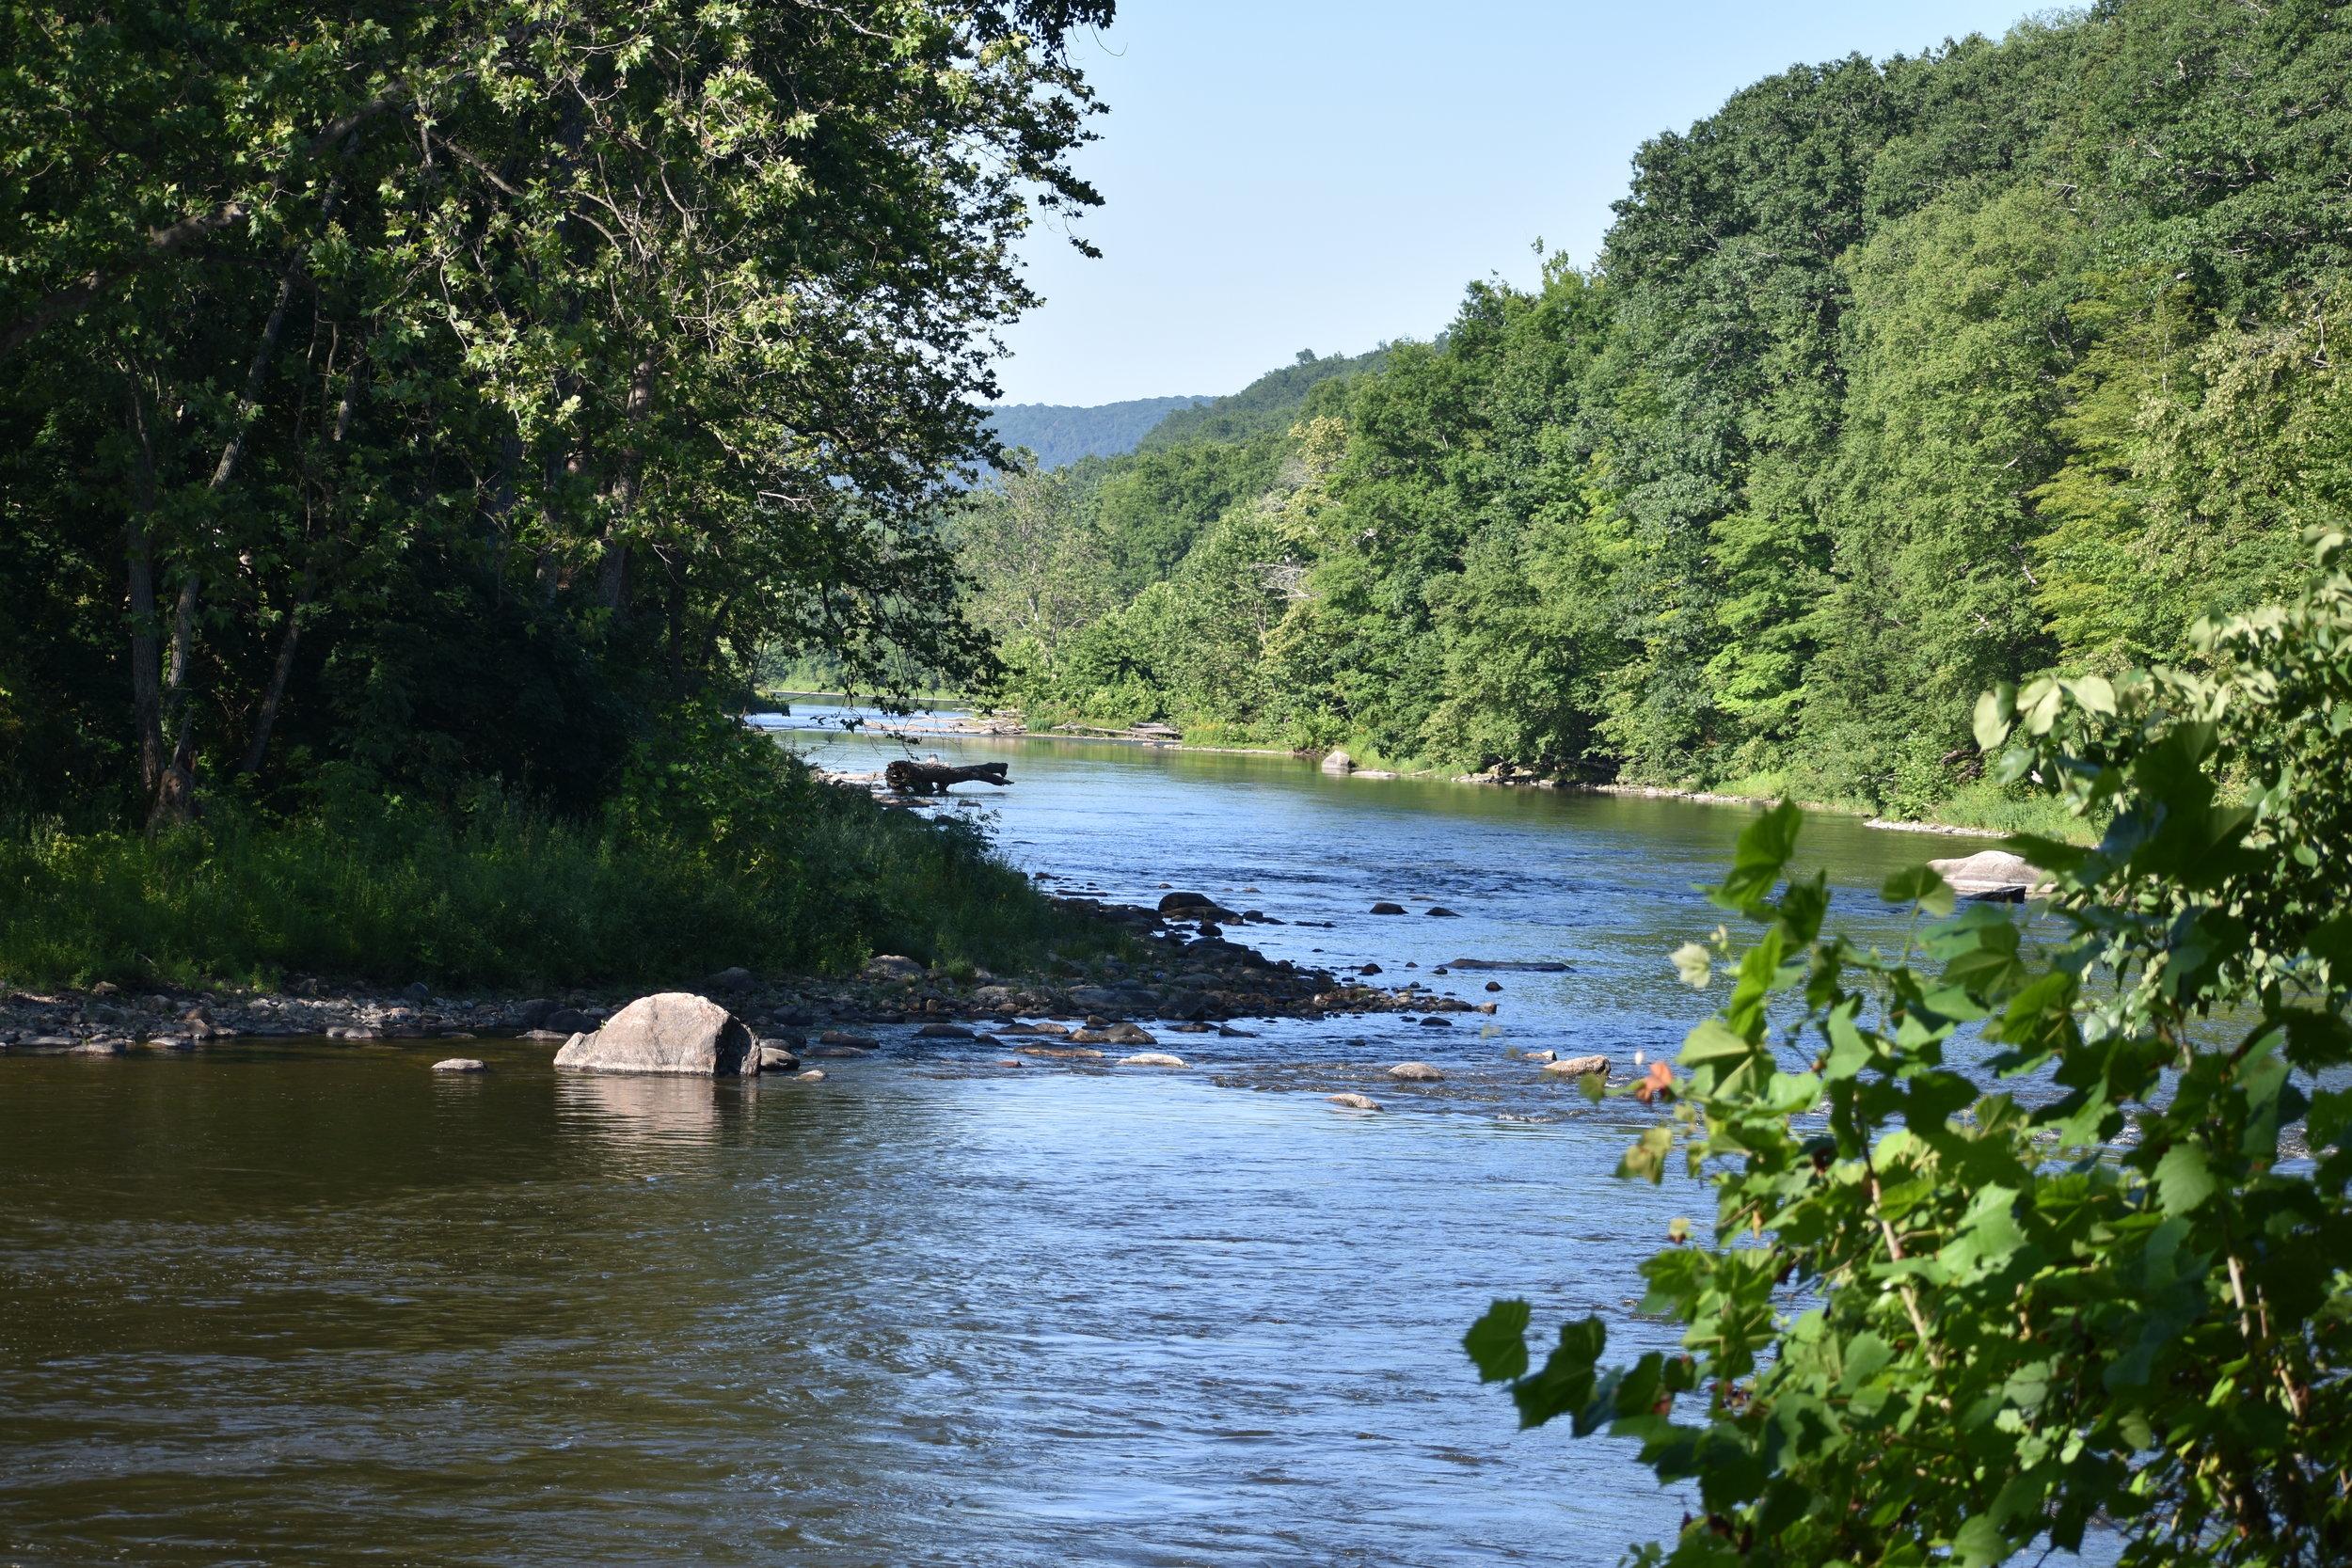 River Habitat